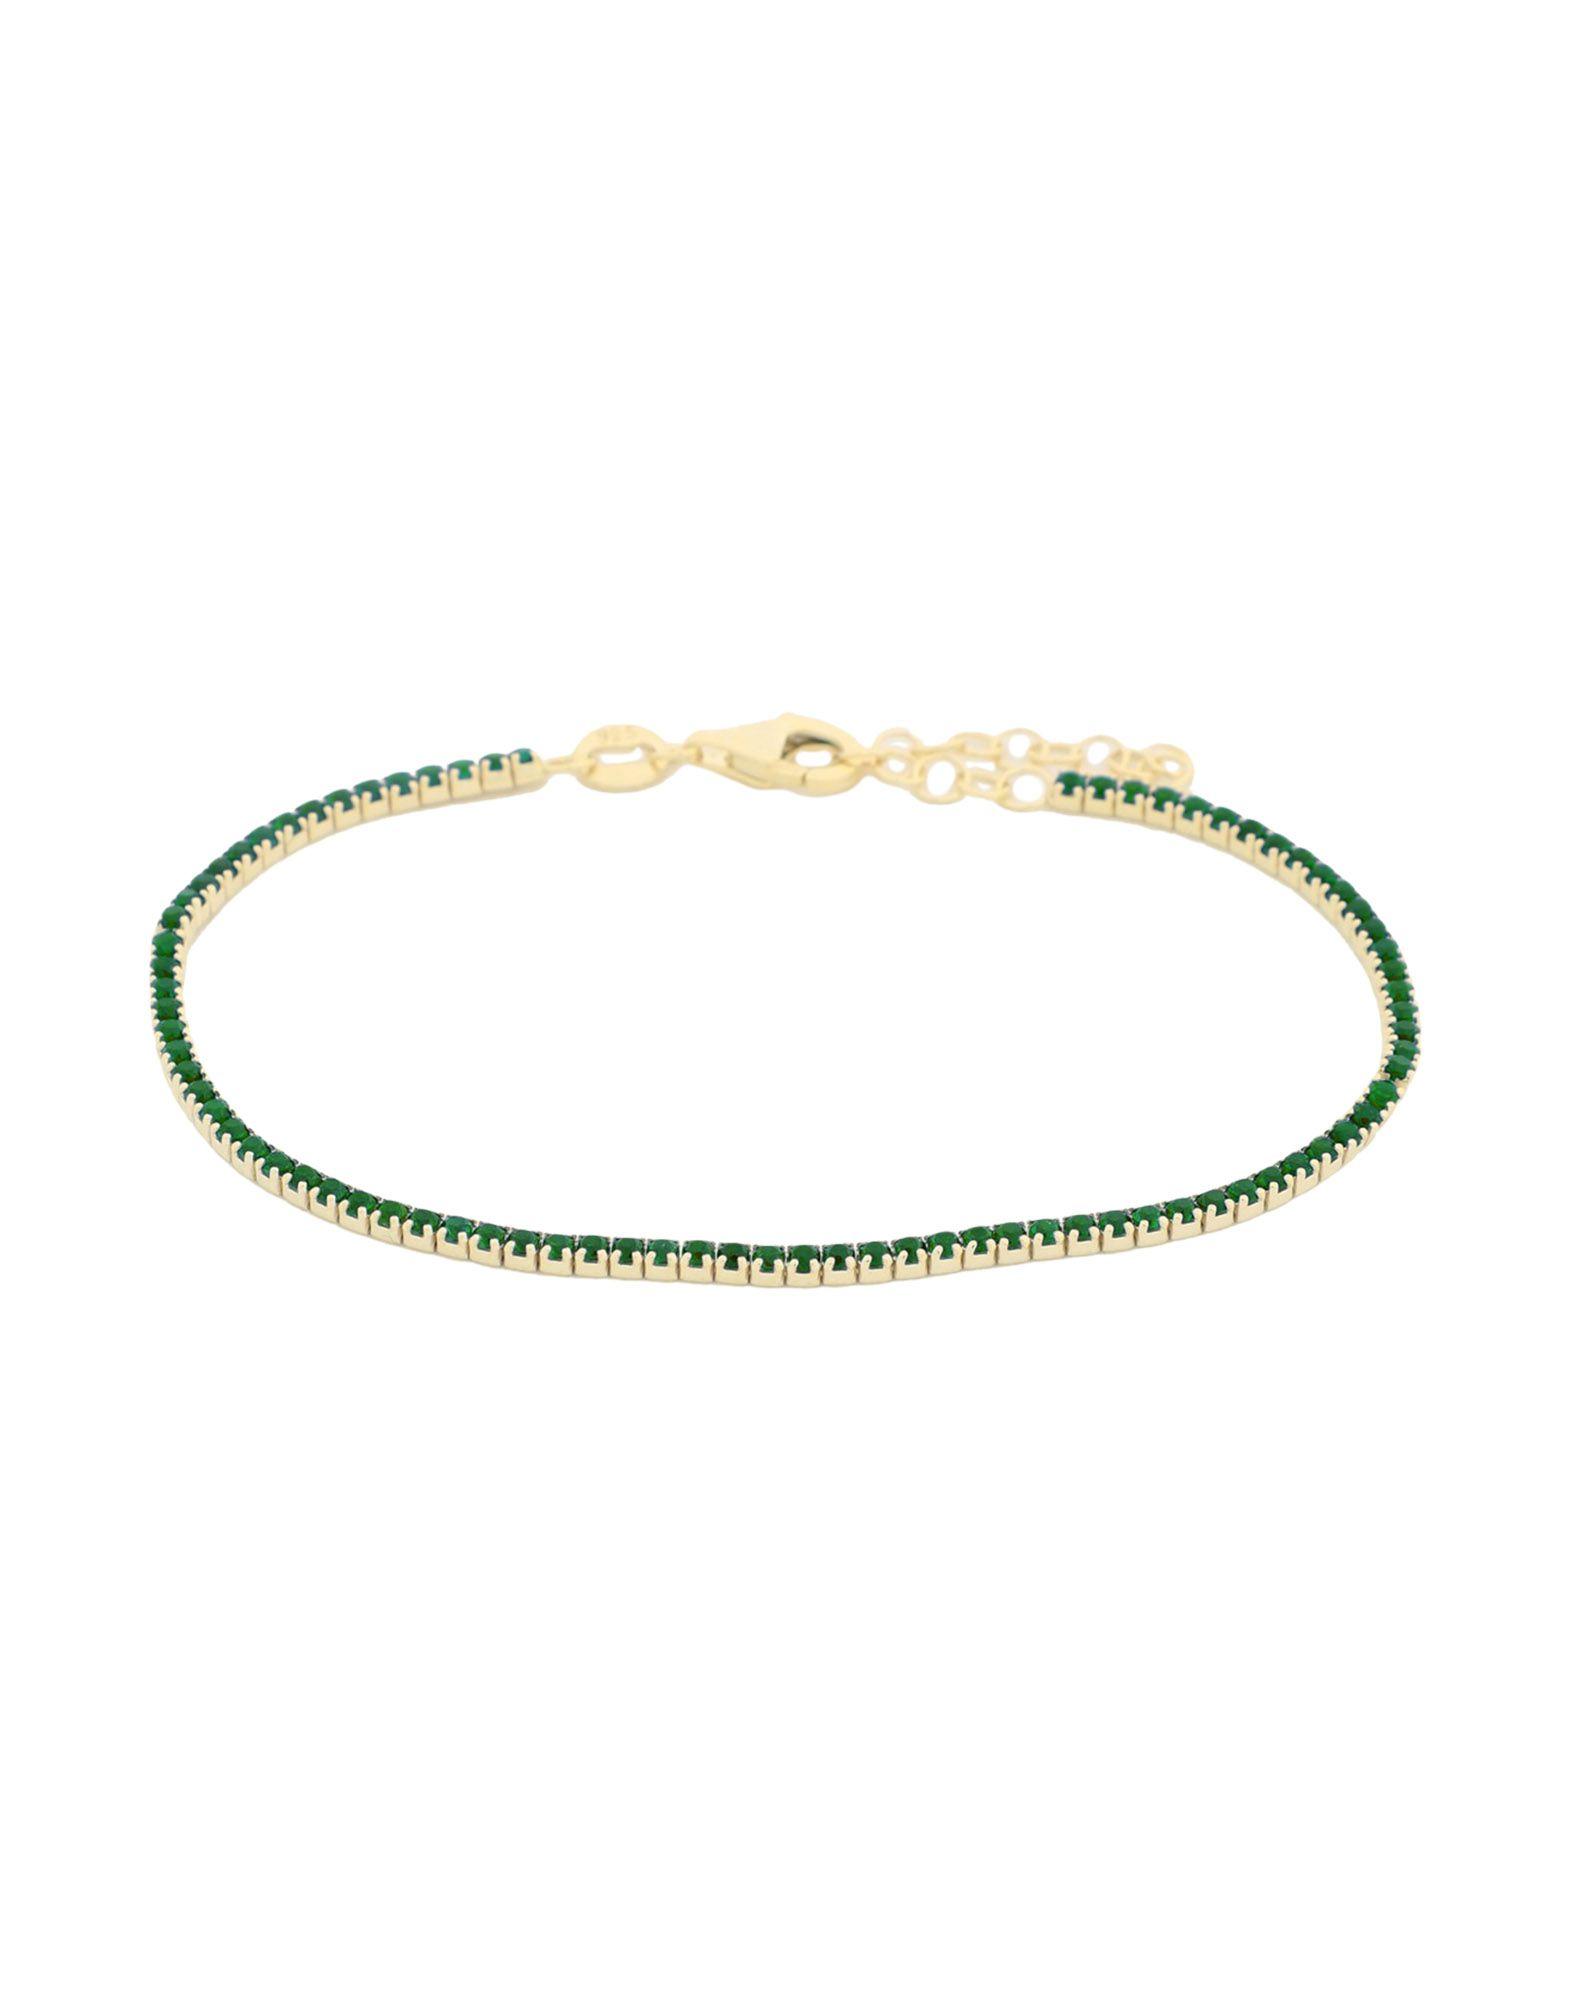 SPHERA MILANO Bracelets. rhinestones, adjustable hook and chain fastening. 925/1000 silver, 18kt Gold-plated